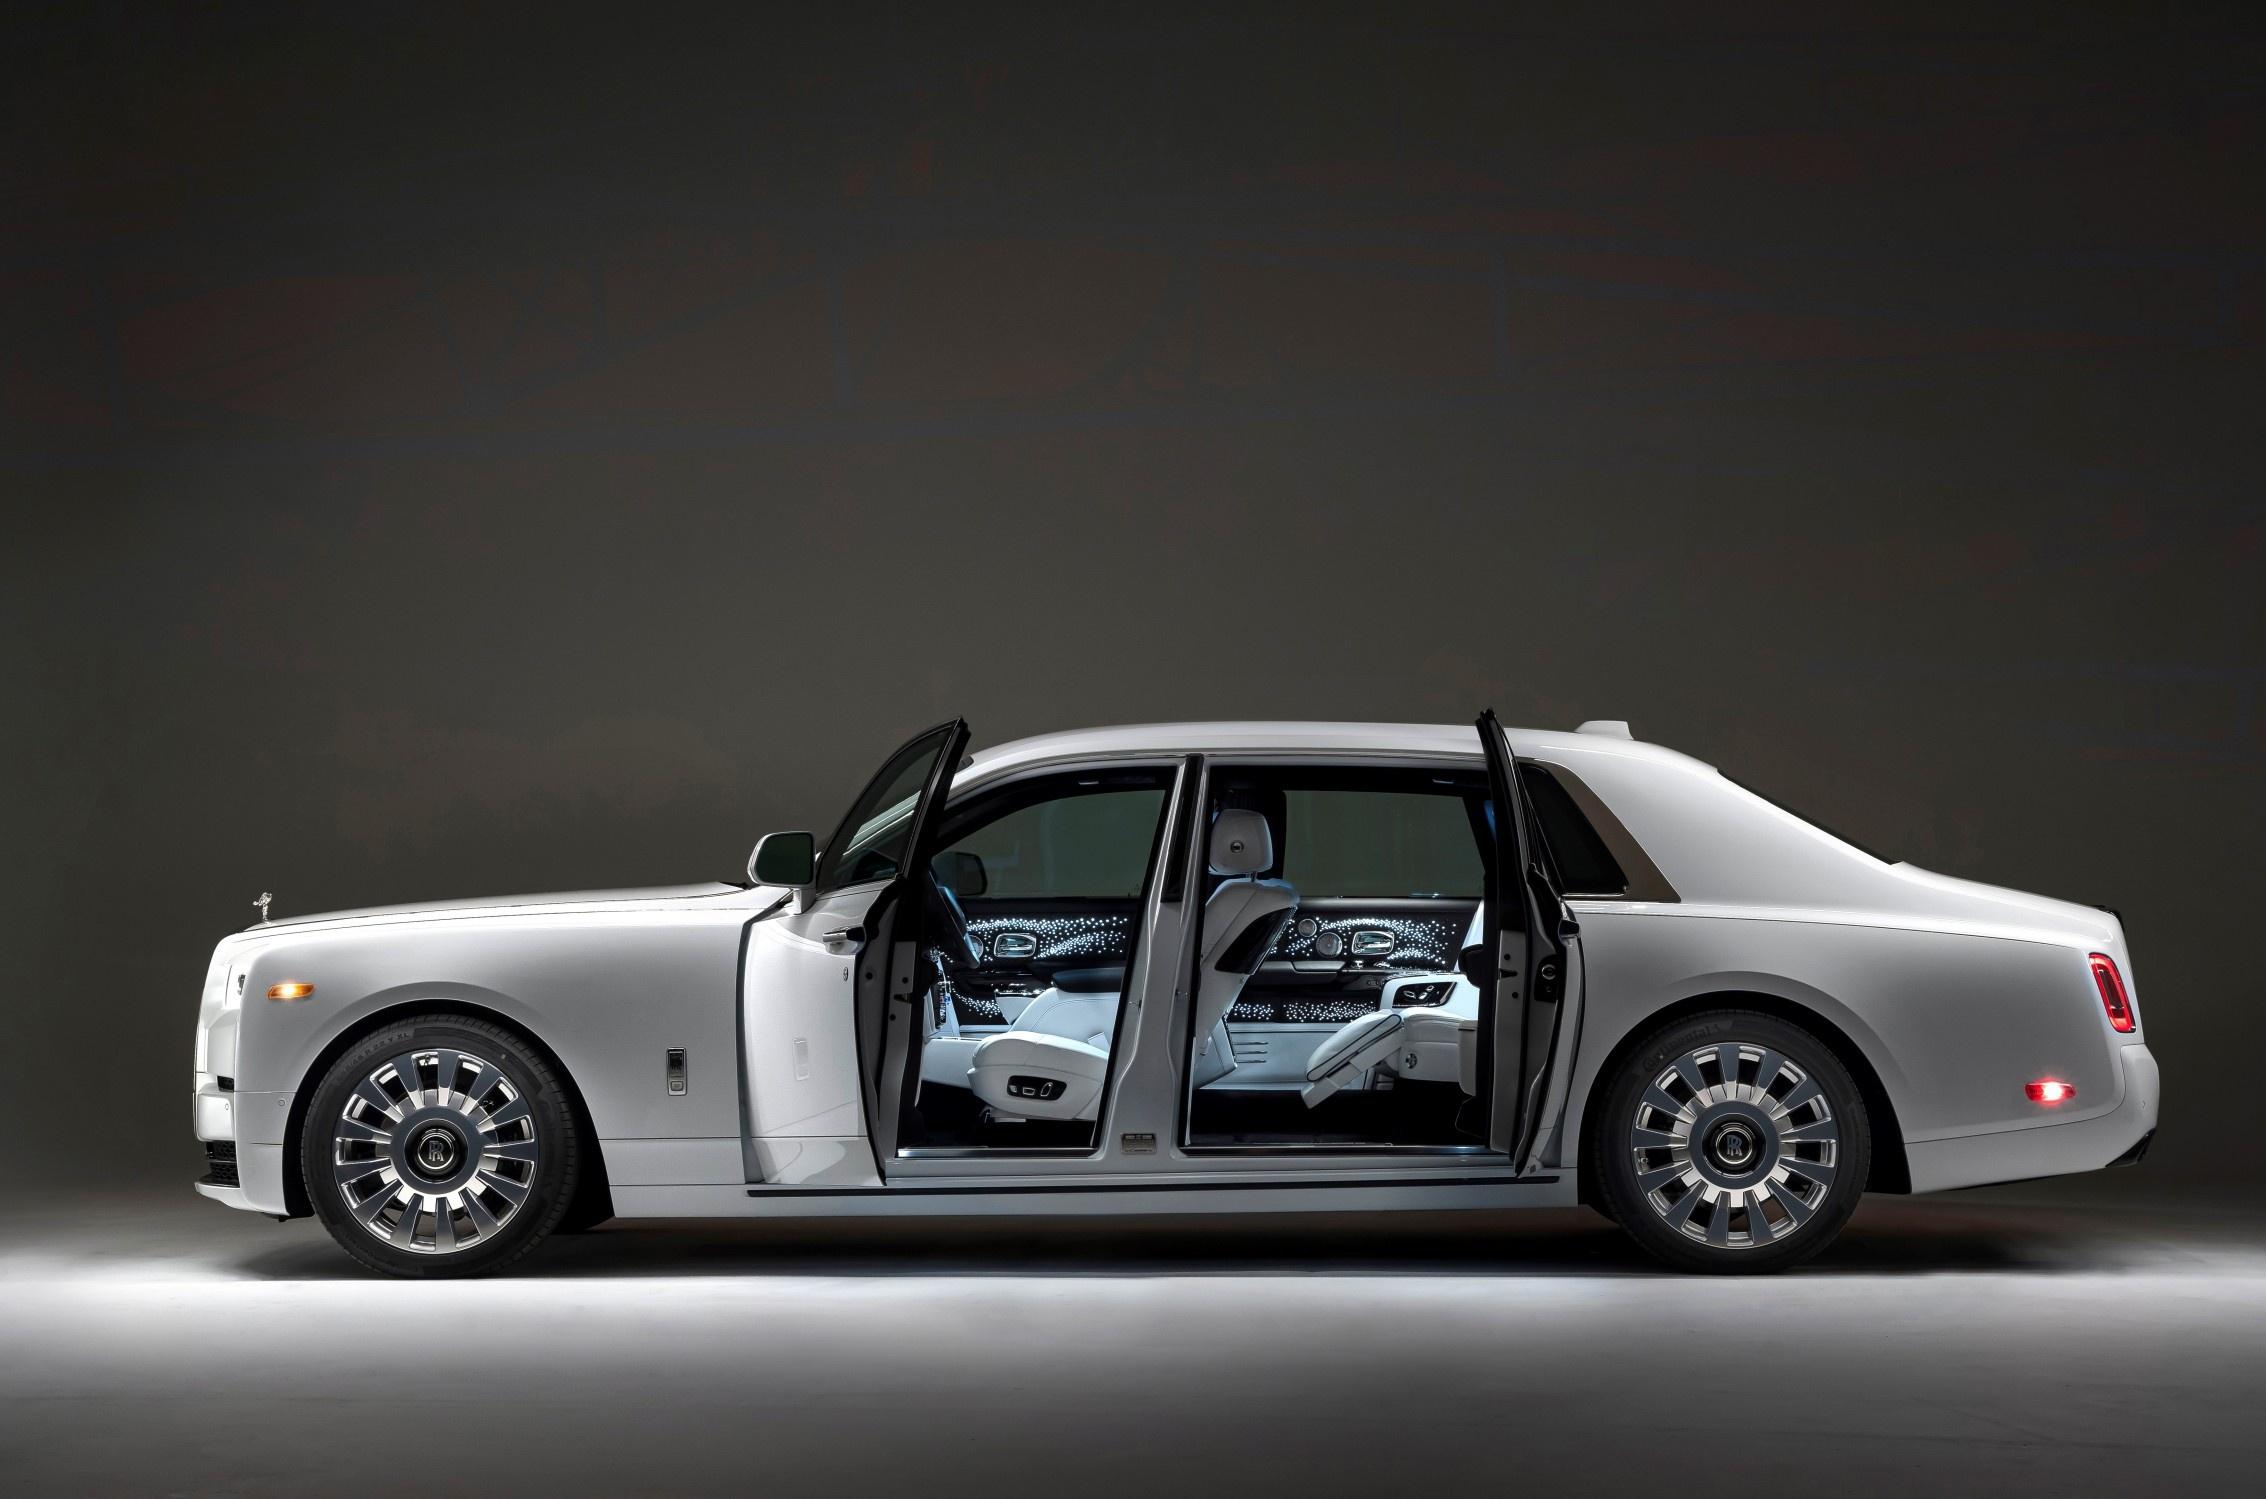 ban dac biet Rolls-Royce Phantom Tempus anh 13